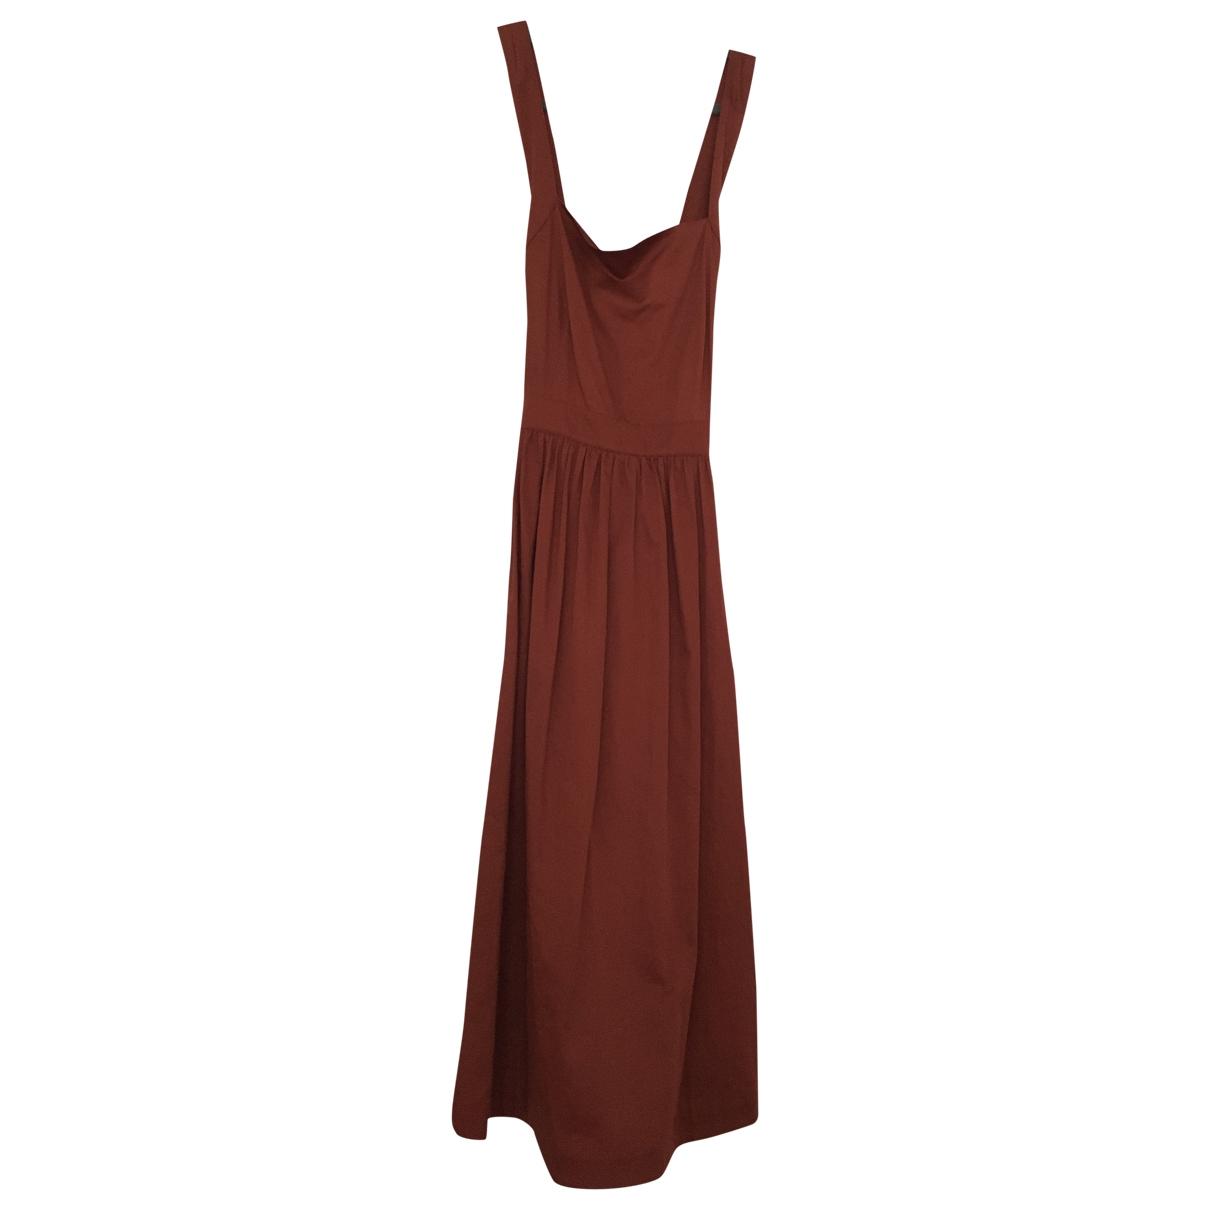 & Stories \N Brown Cotton dress for Women 42 FR